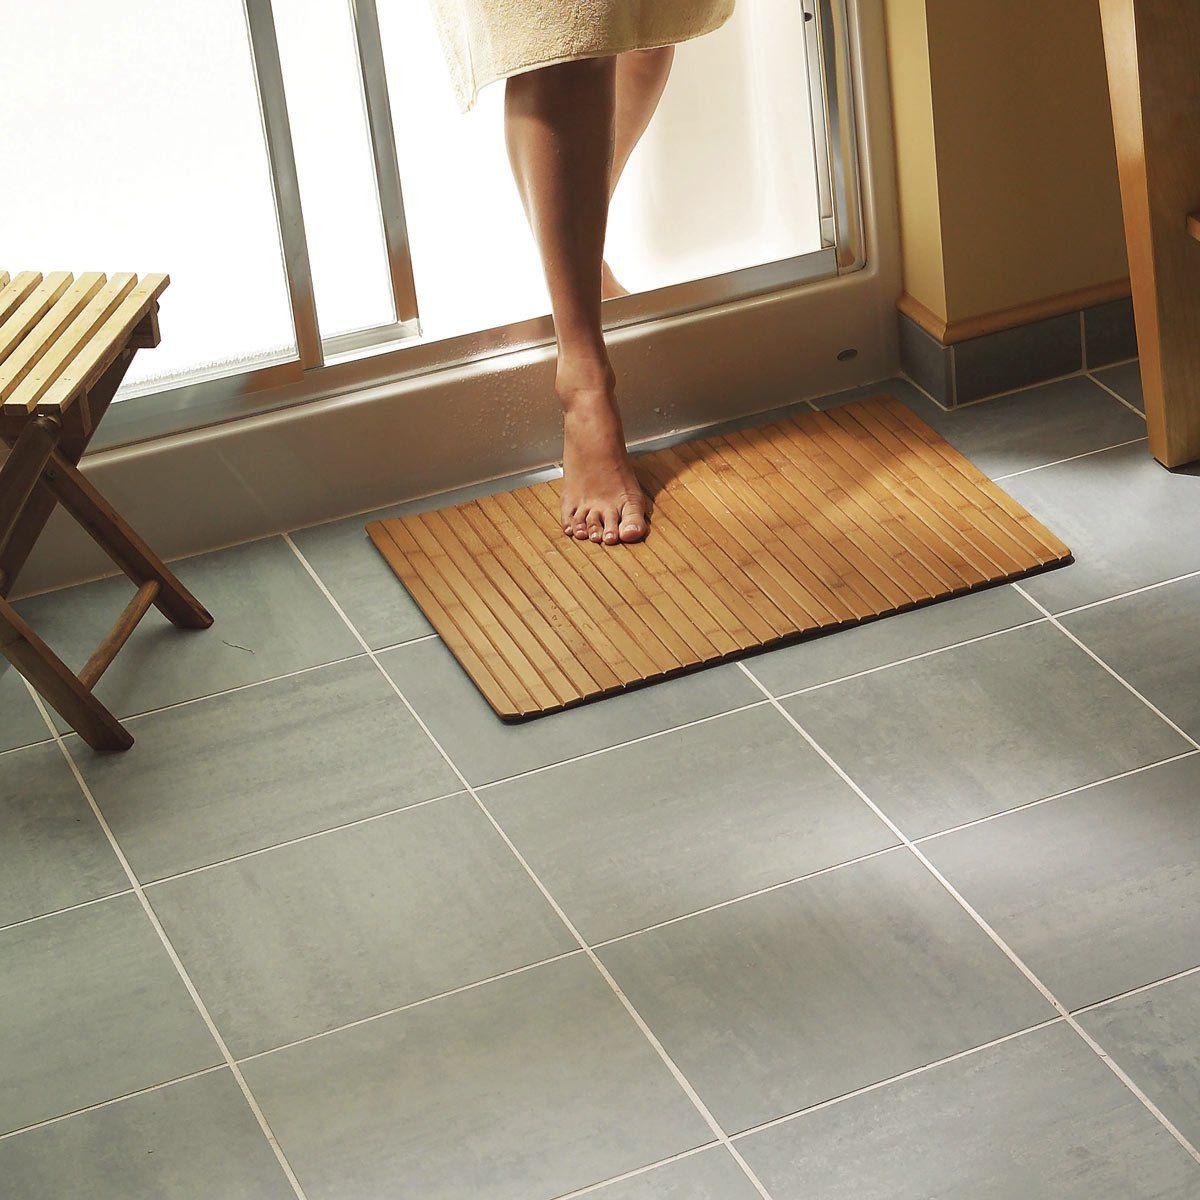 Installing Tile Bathroom Floor